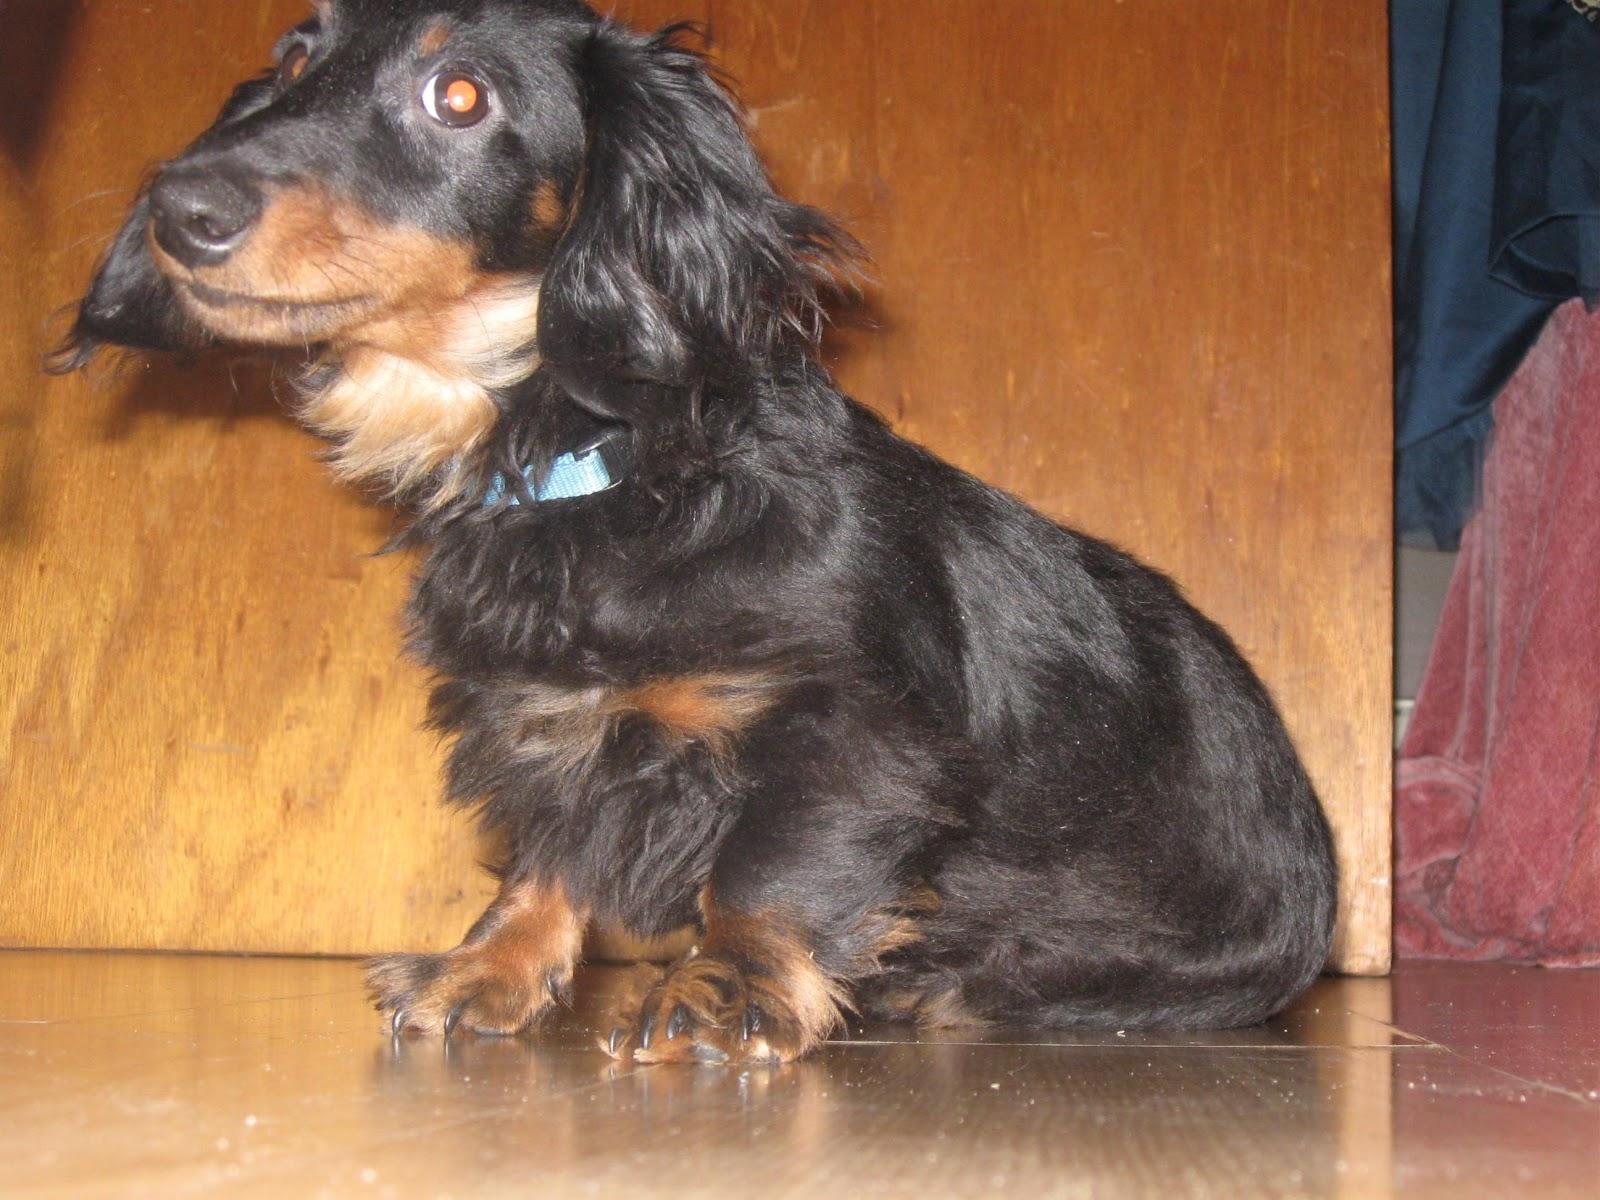 Dachshund Husky Mix - Dog Training Home | Dog Types